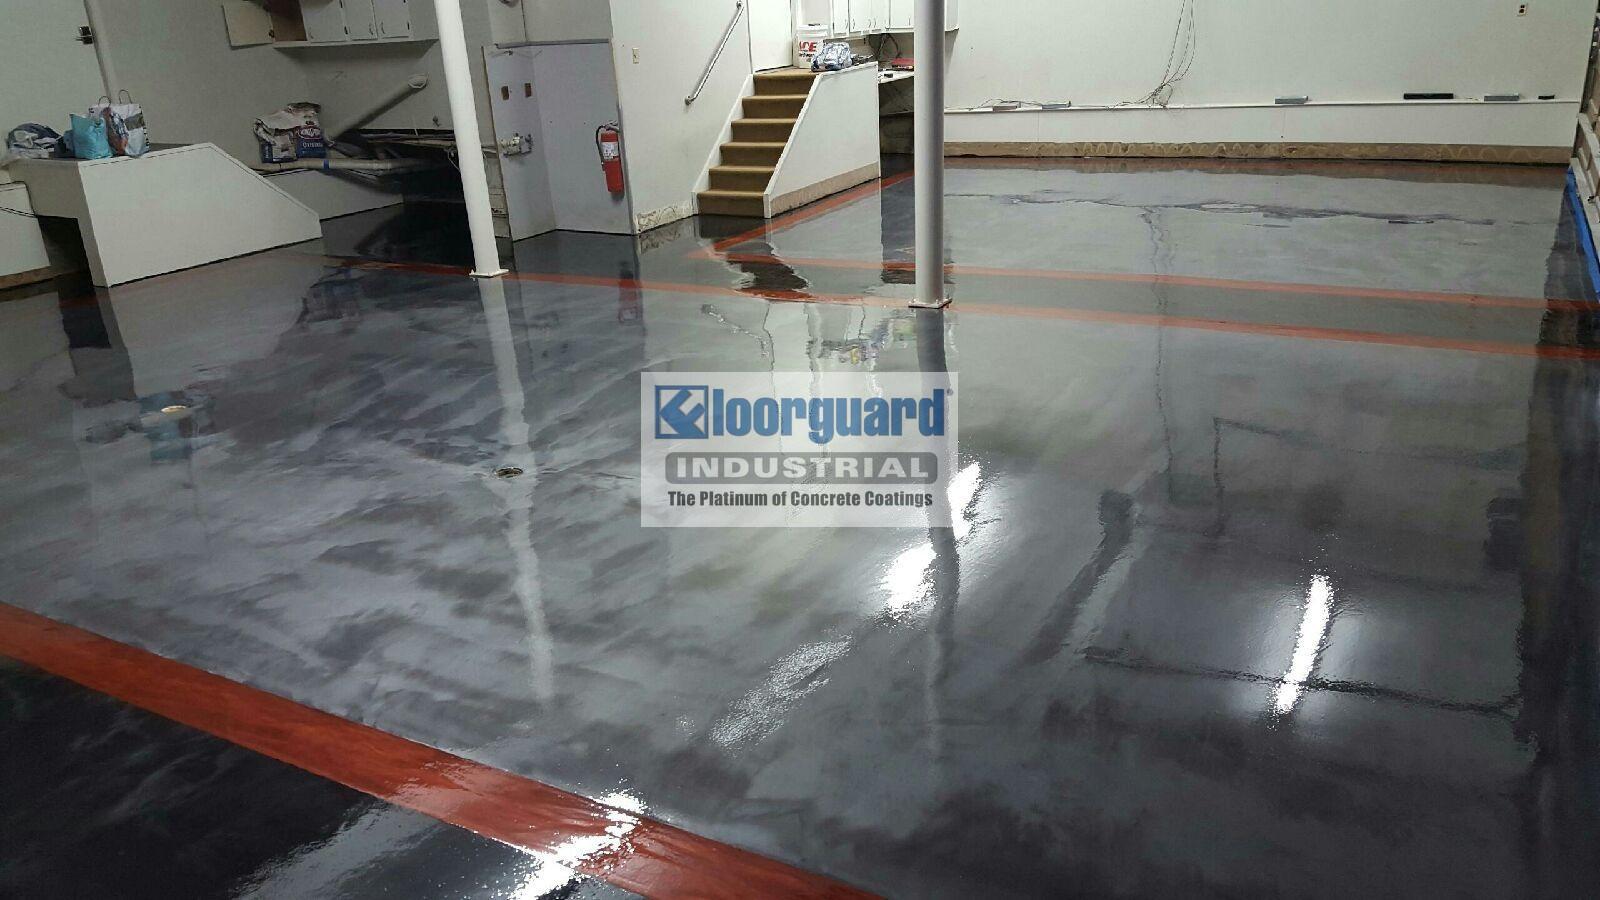 Floor Coverings for Concrete Floors | Floorguard.com